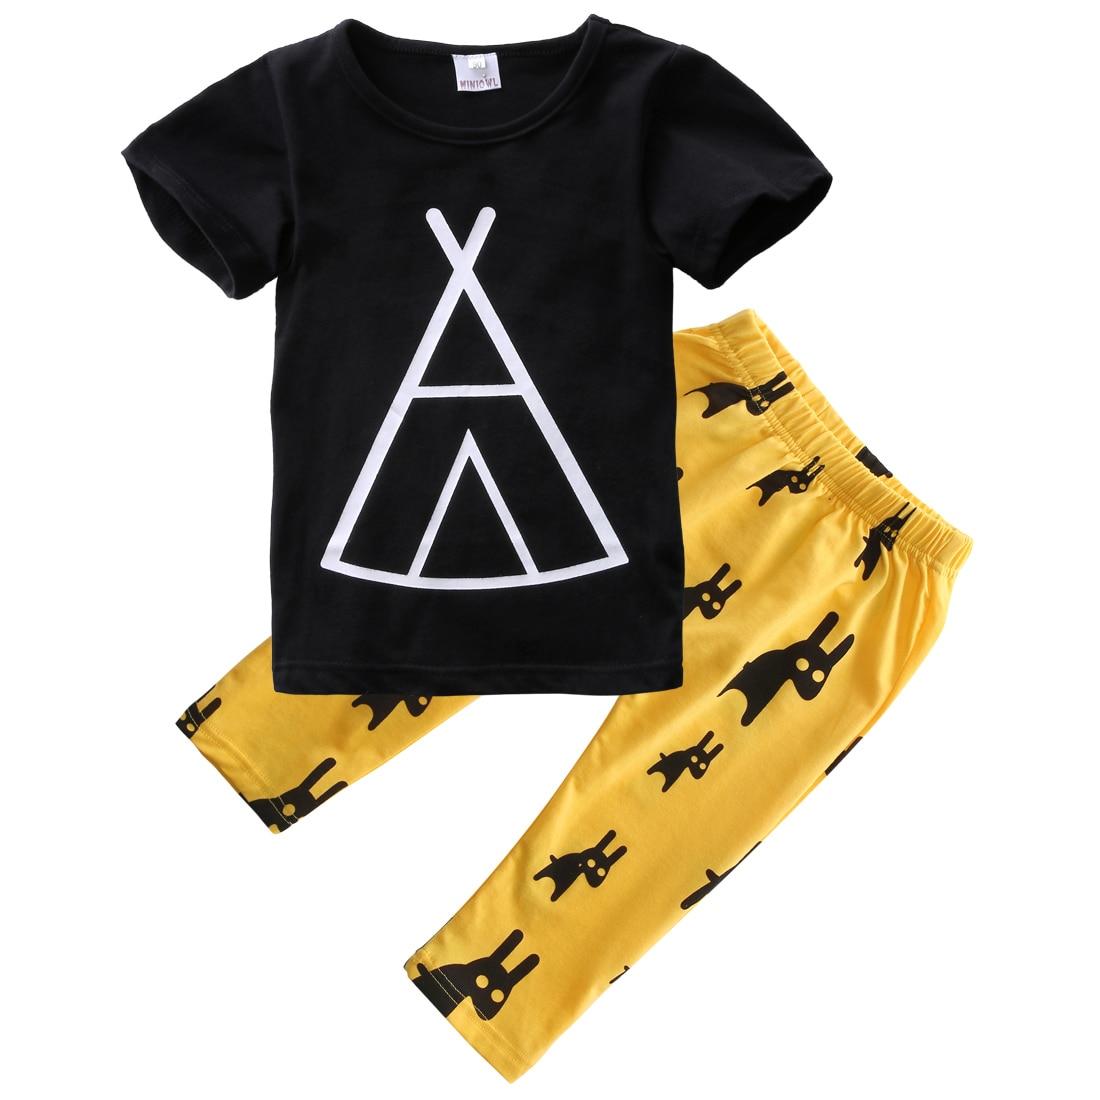 Black t shirt for babies - Fashion Pretty Casual Kids Baby Boy Short Sleeve Black T Shirt Tops Yellow Long Pants 2pcs Set 0 5years